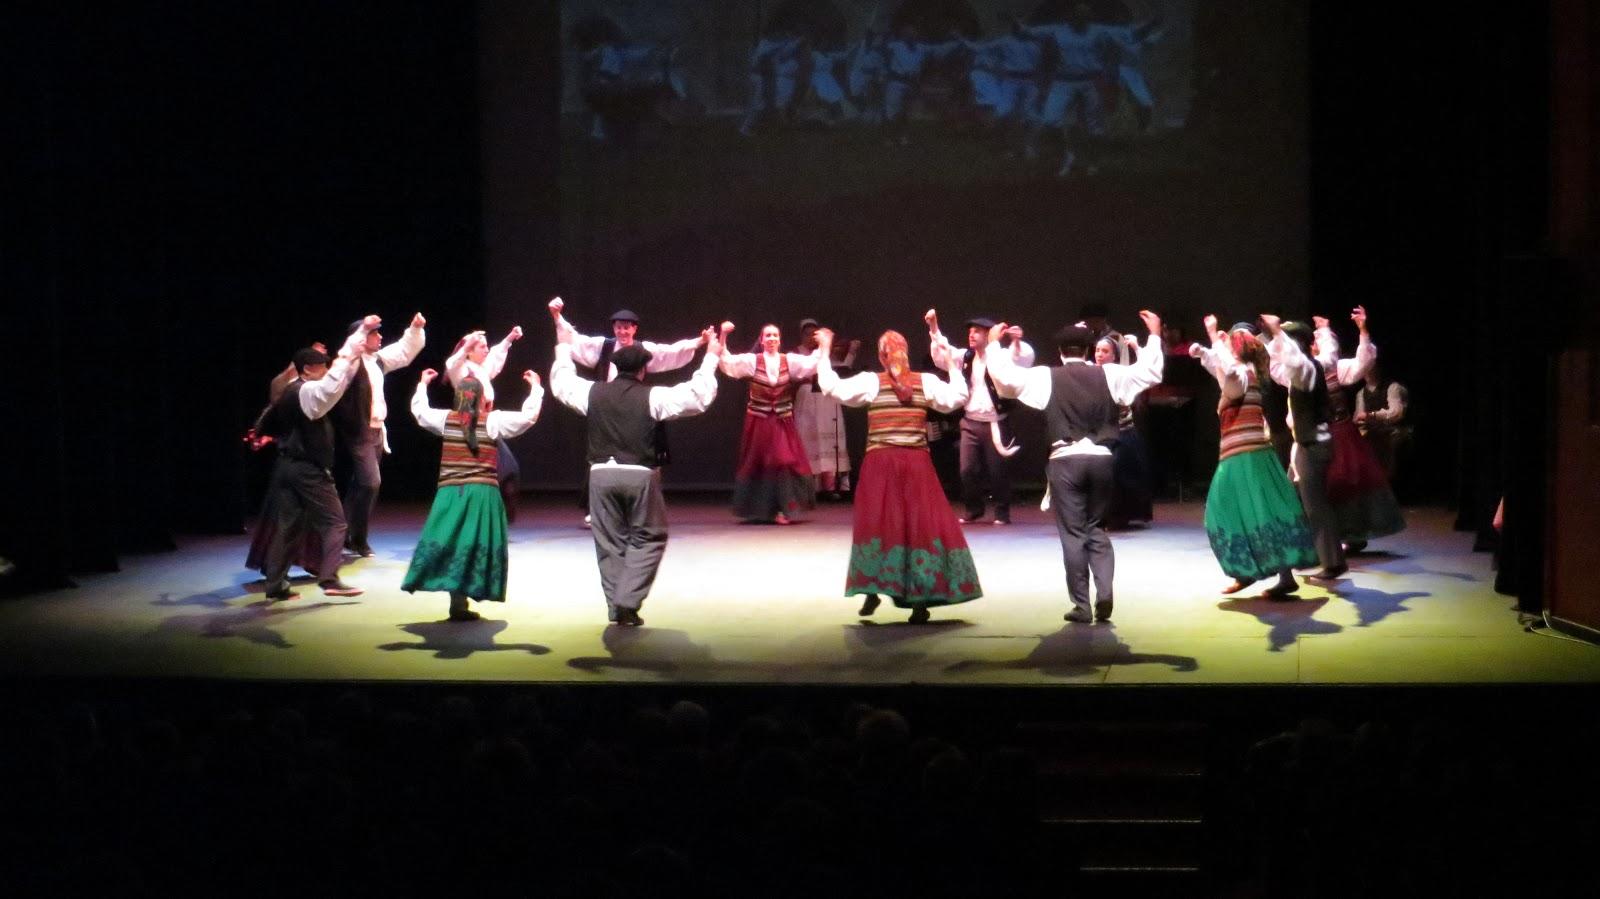 Festival de Ibarra-Kaldu en 2012